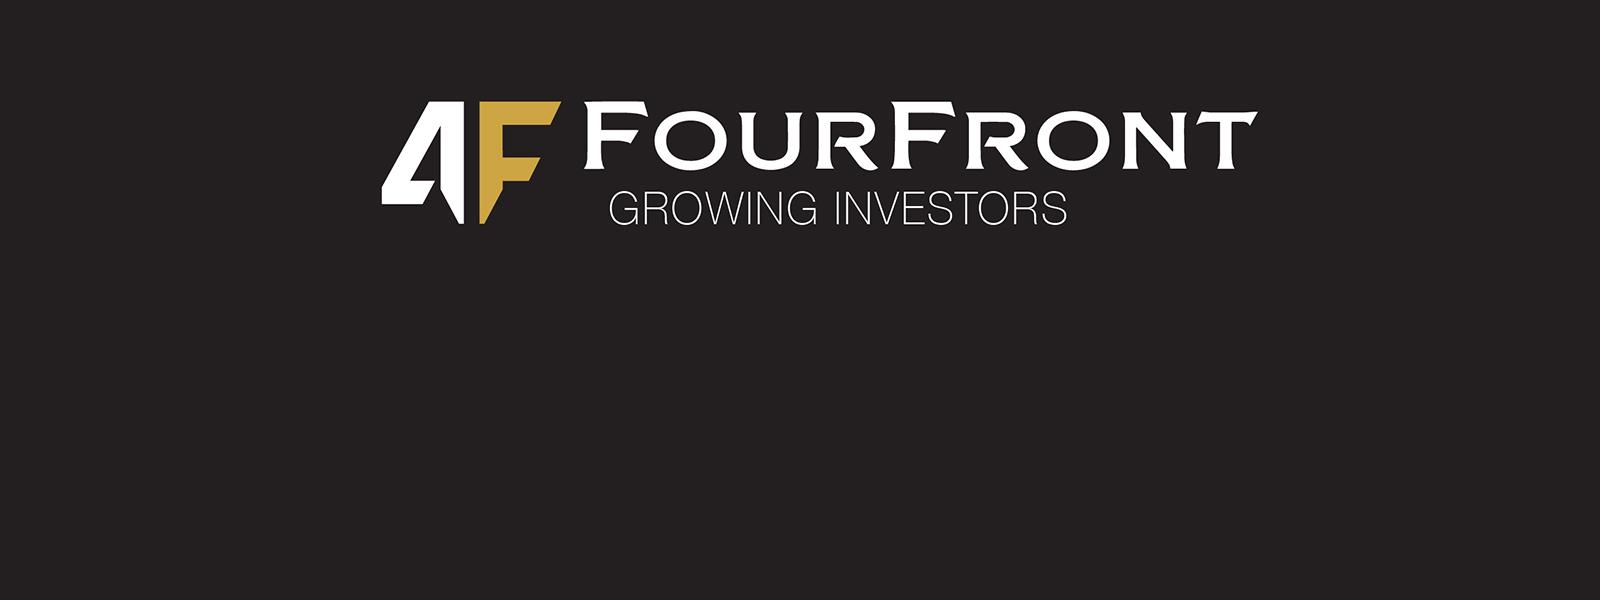 FourFront Management Admitted to the Regulatory Sandbox